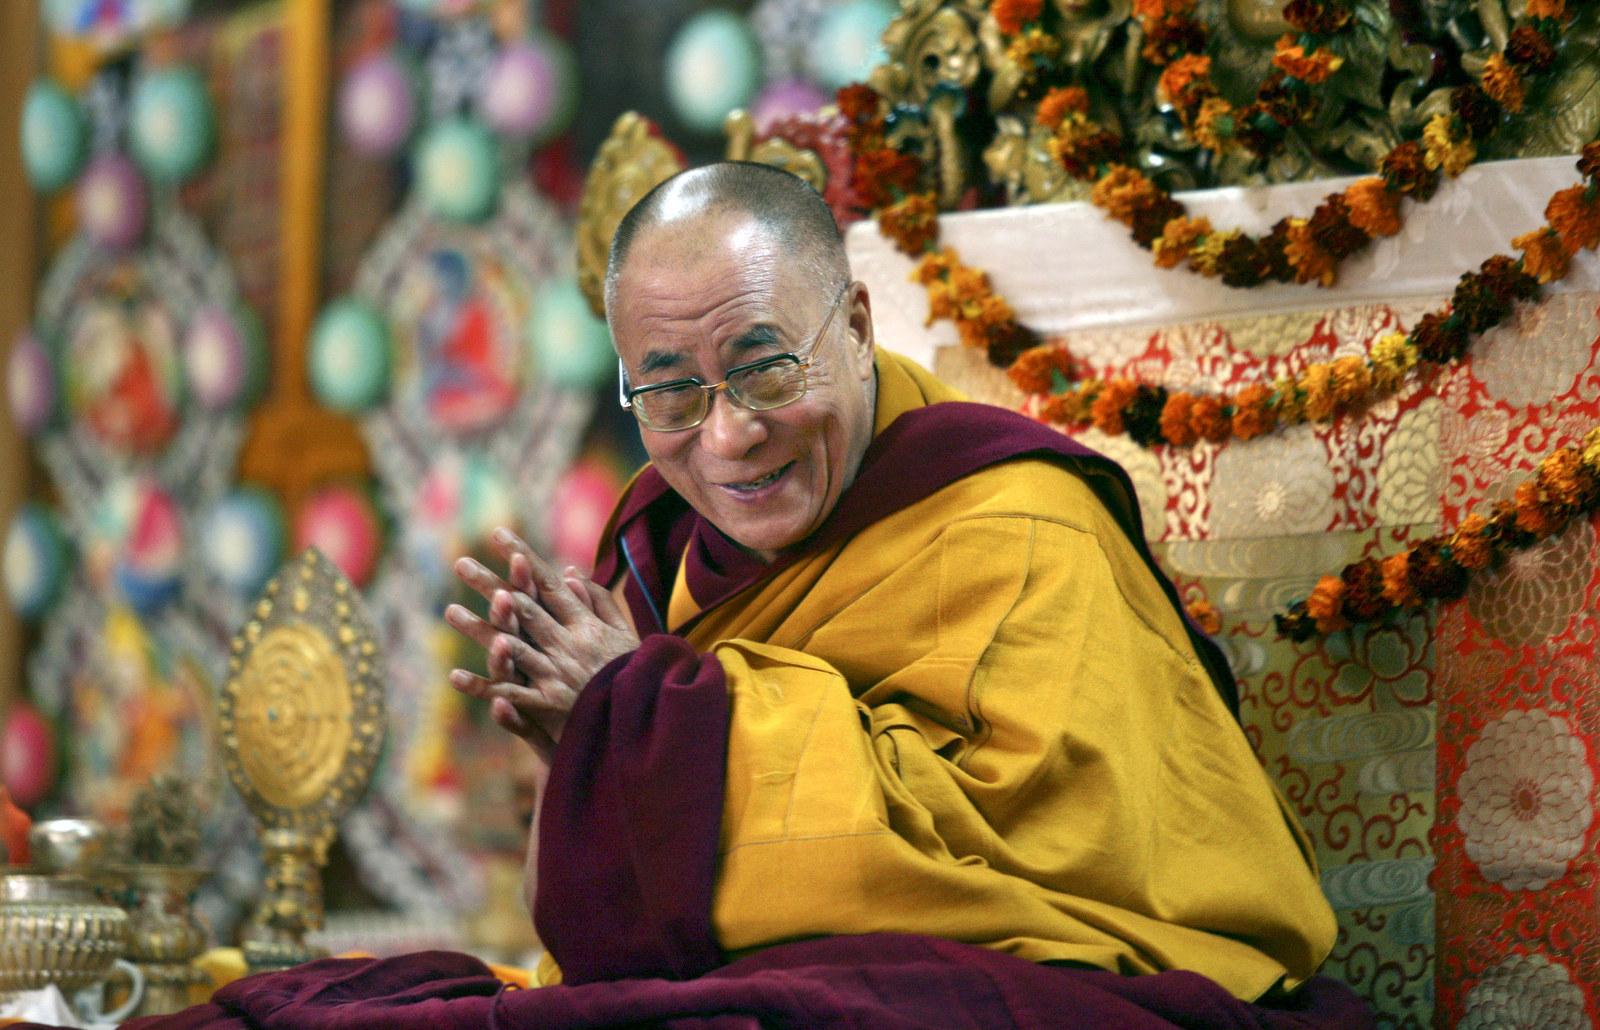 Dalai Lama Remains Hospitalized After Canceling U.S. Appearances